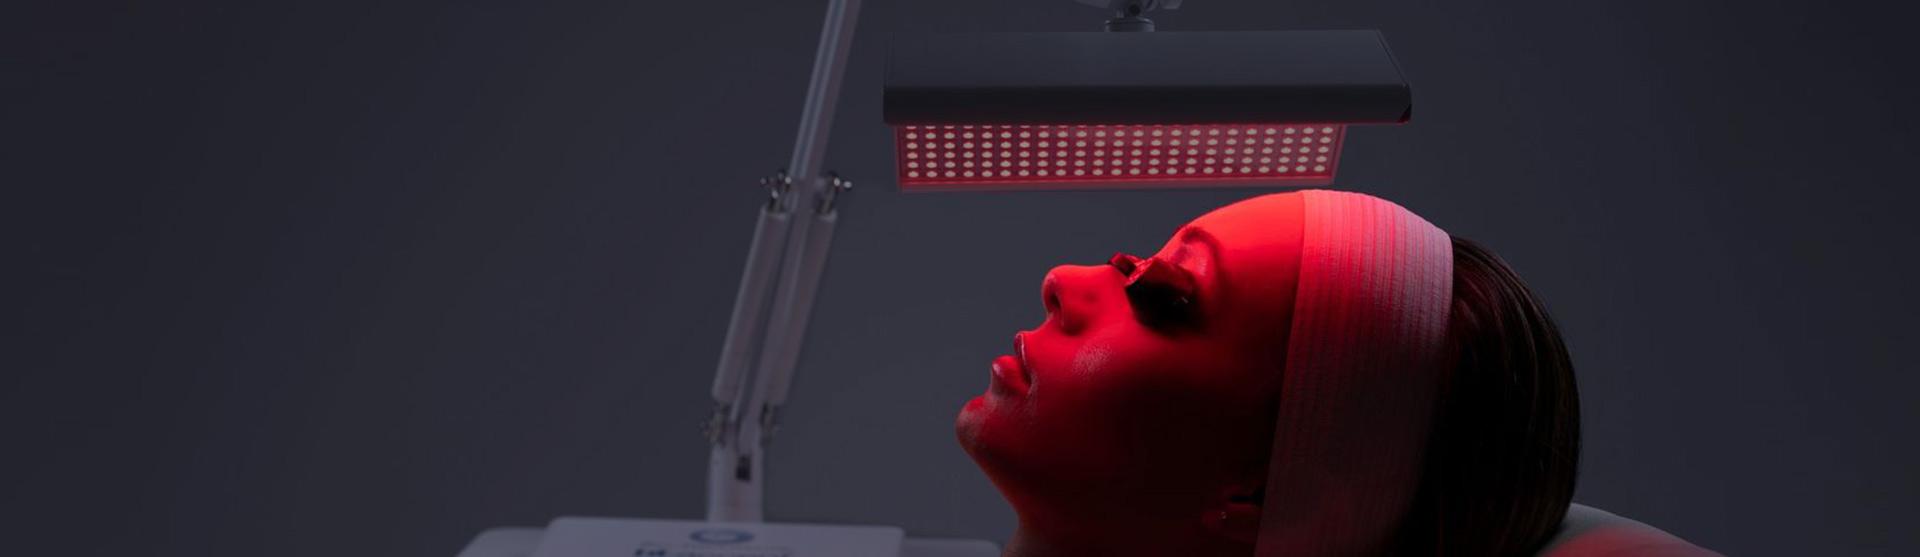 kozmeticki-salon-diva-plus-tretmani-lica-led-laser-cover